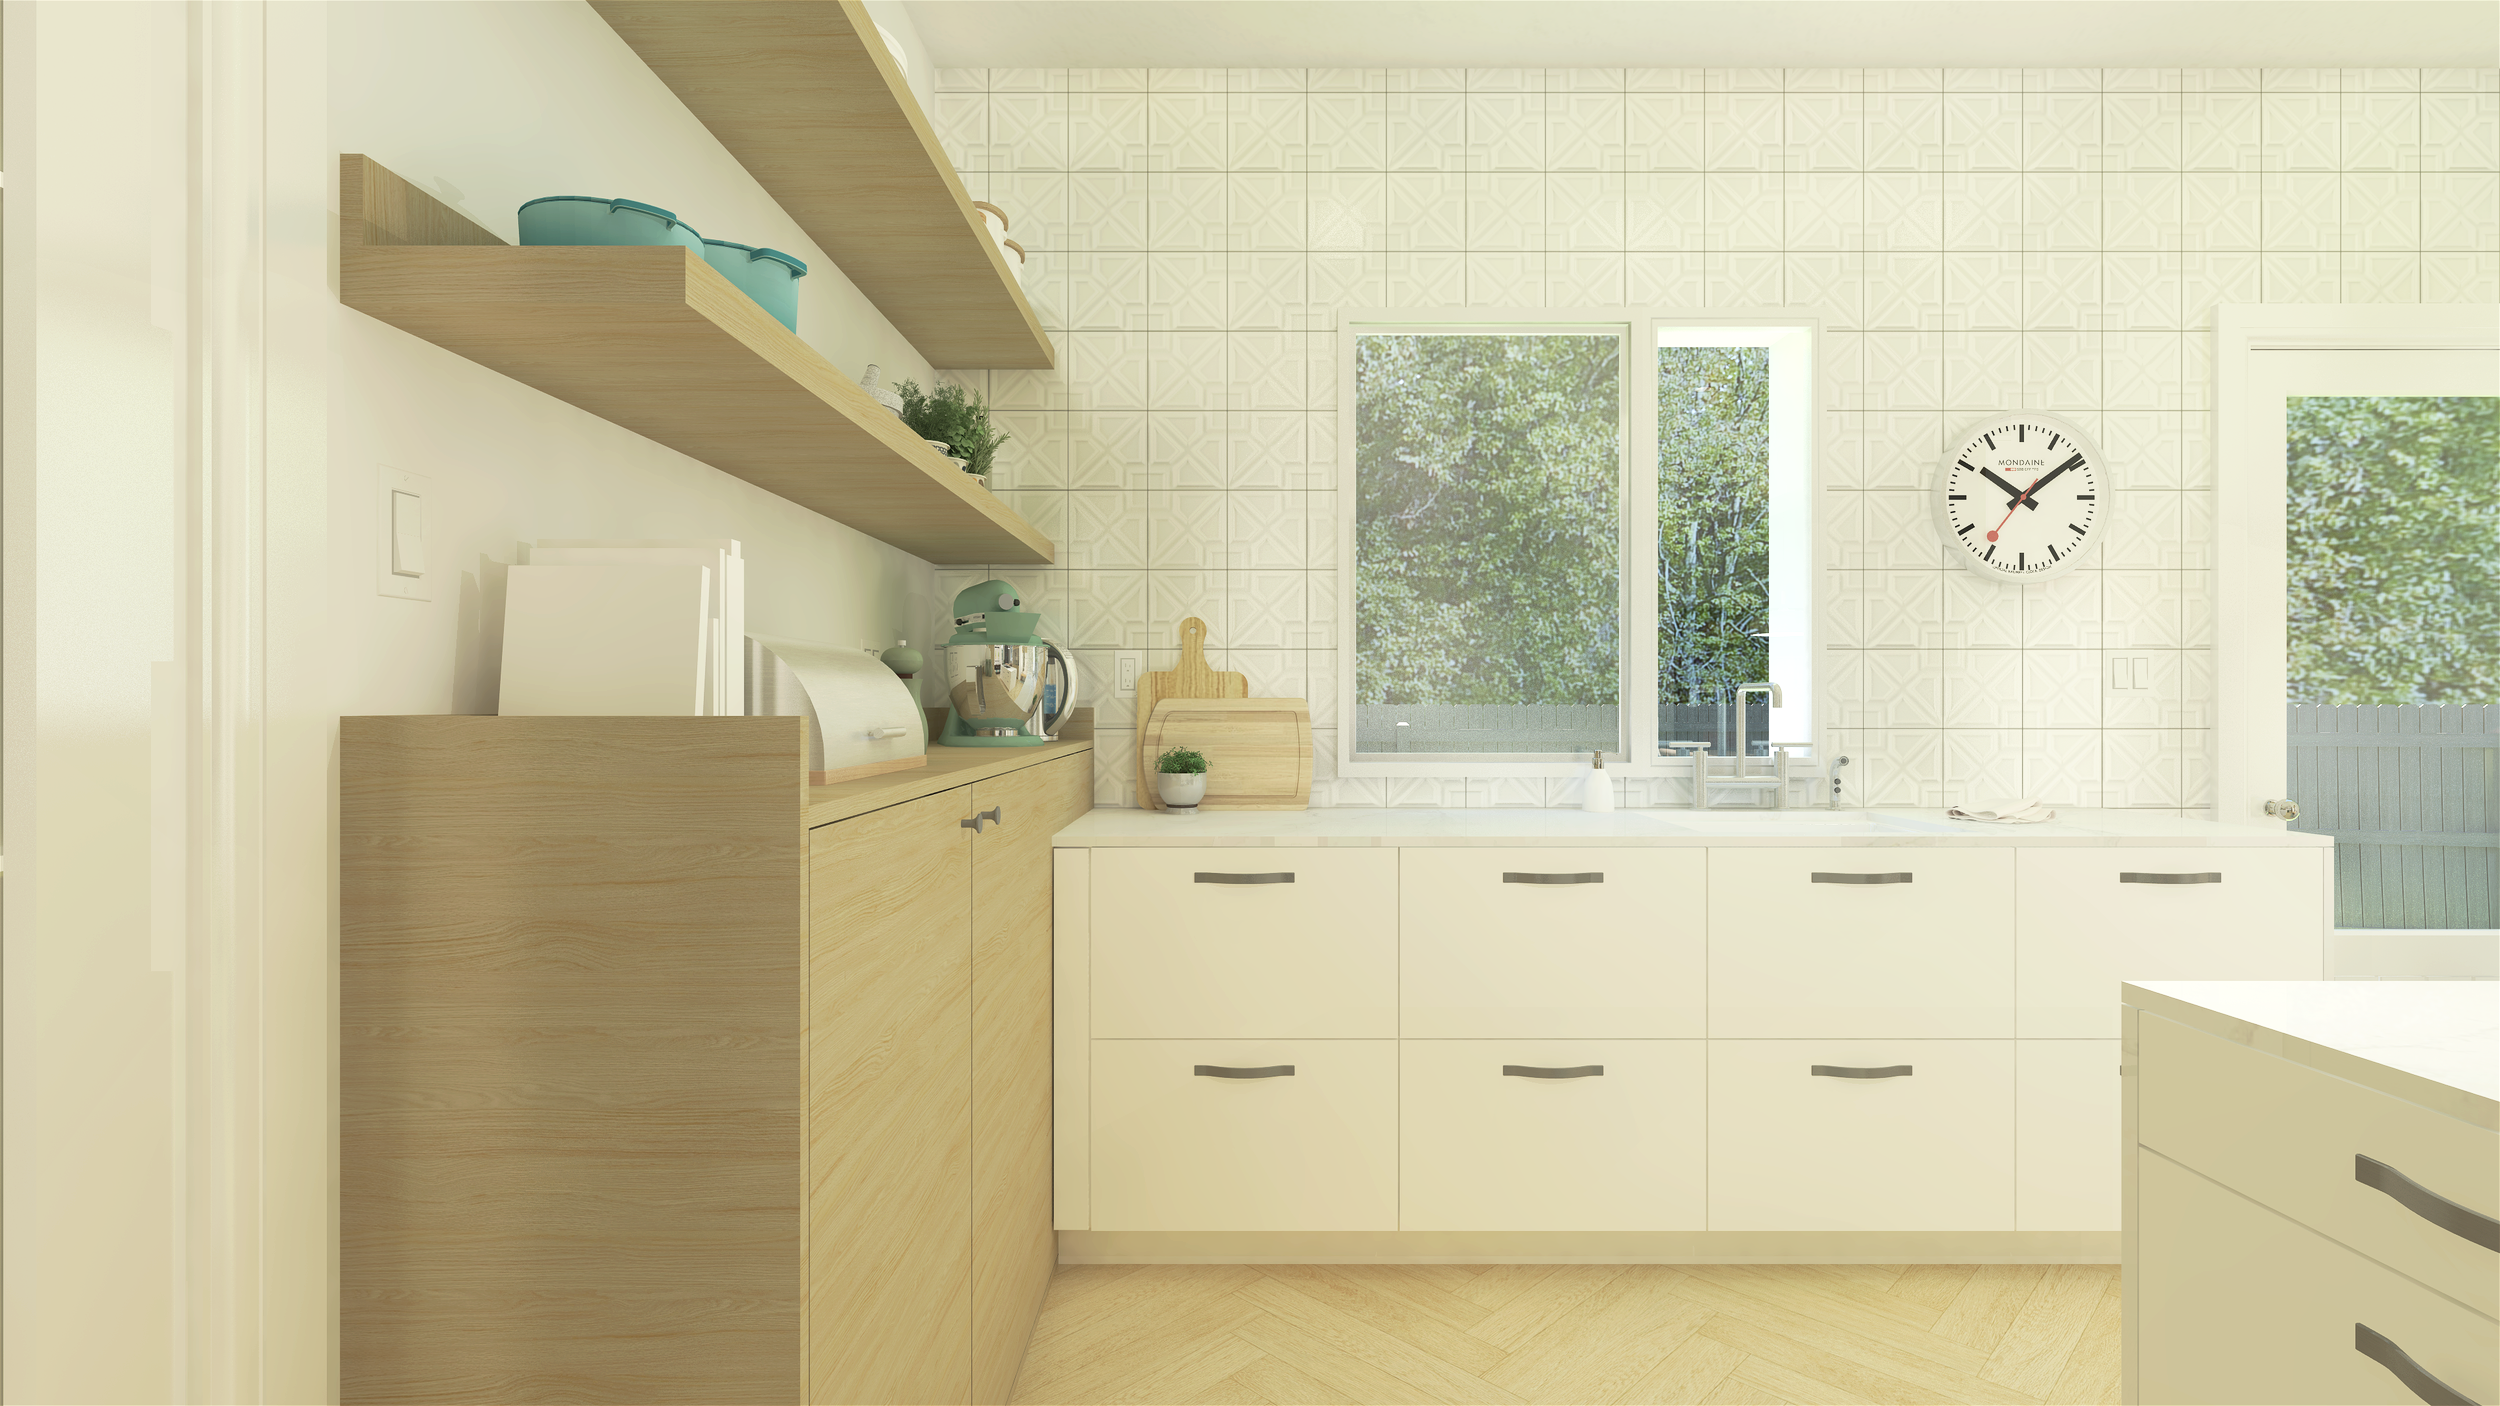 deSousaDESIGN_Kitchen_Modern_Suburbia_V1d_3840x2160.png